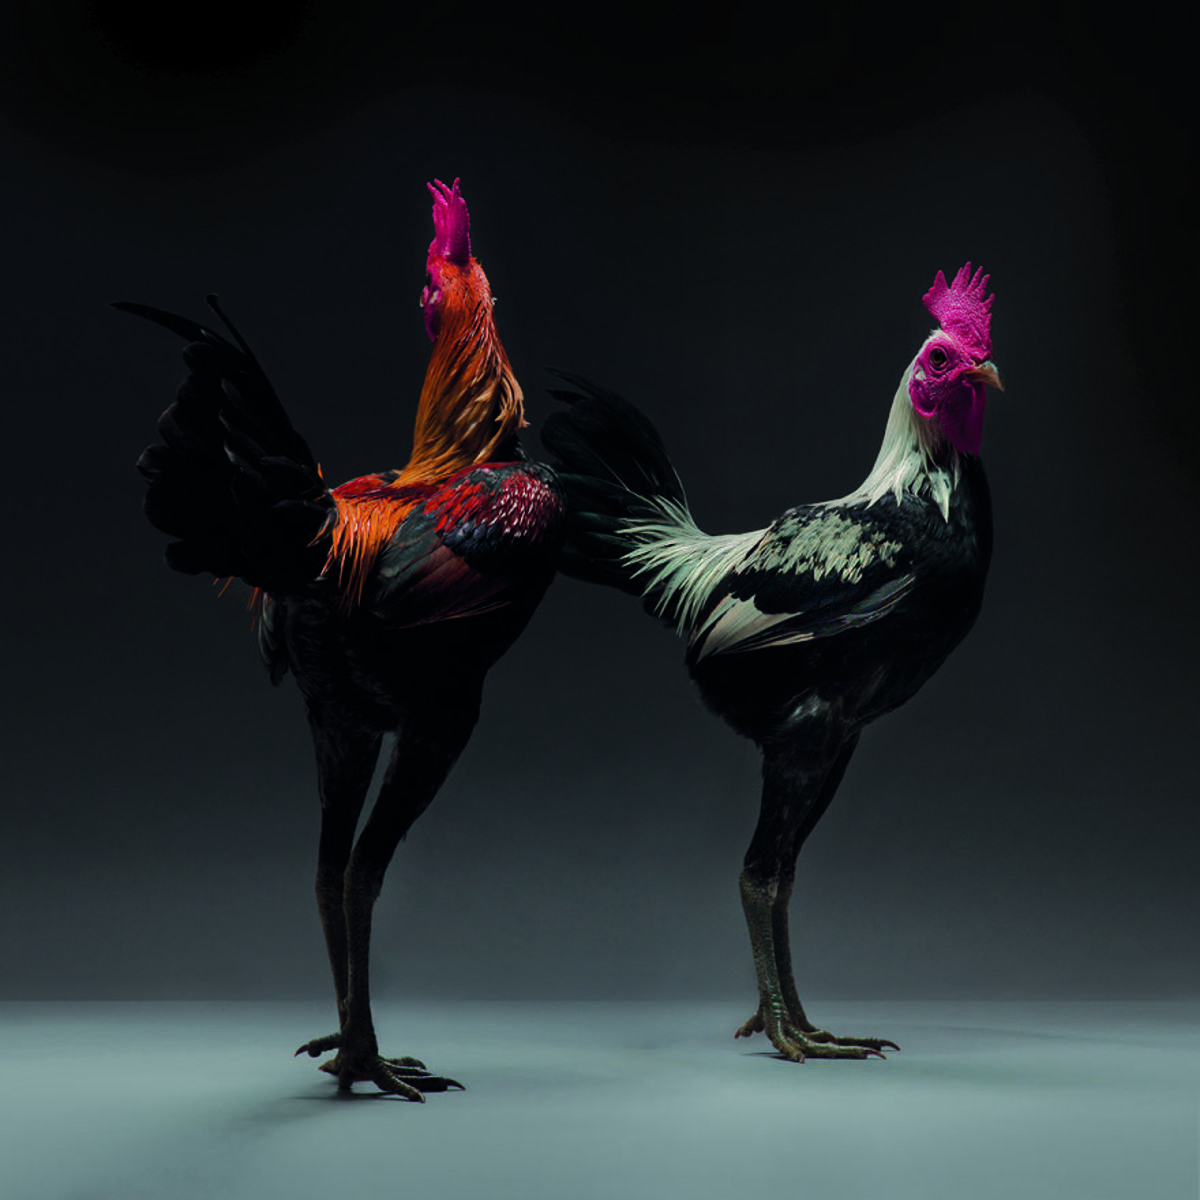 Dazzling Chickens Strut for the Camera in a New Photo Book by Moreno Monti and Matteo Tranchellini